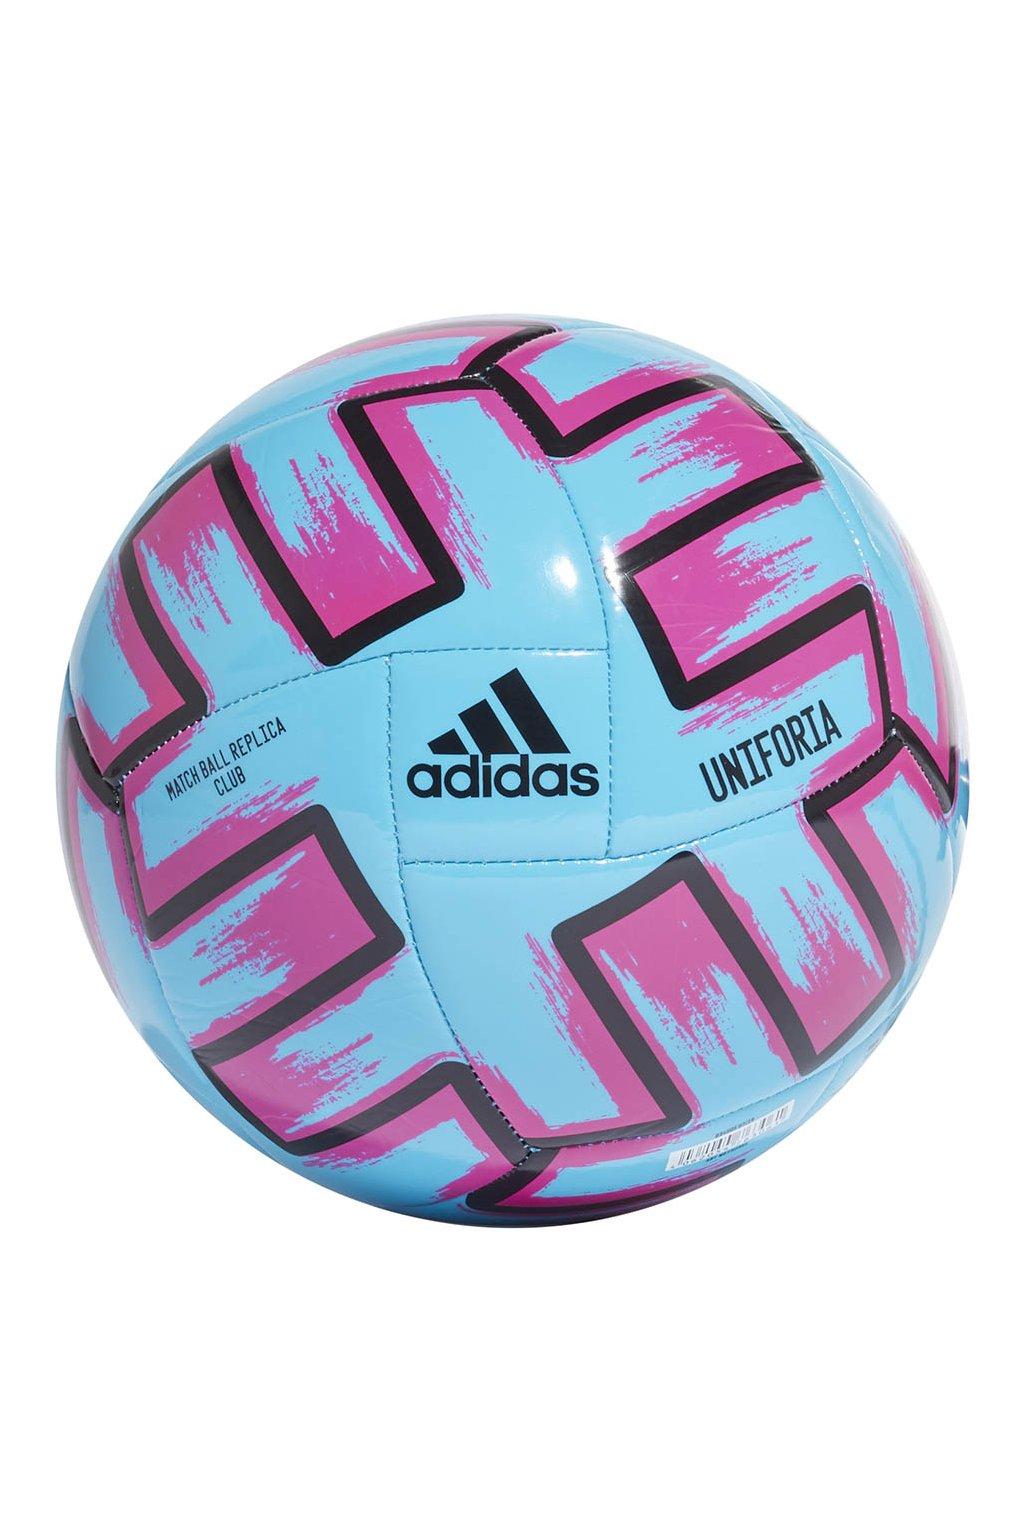 Futbalová lopta Adidas Uniforia FH7355